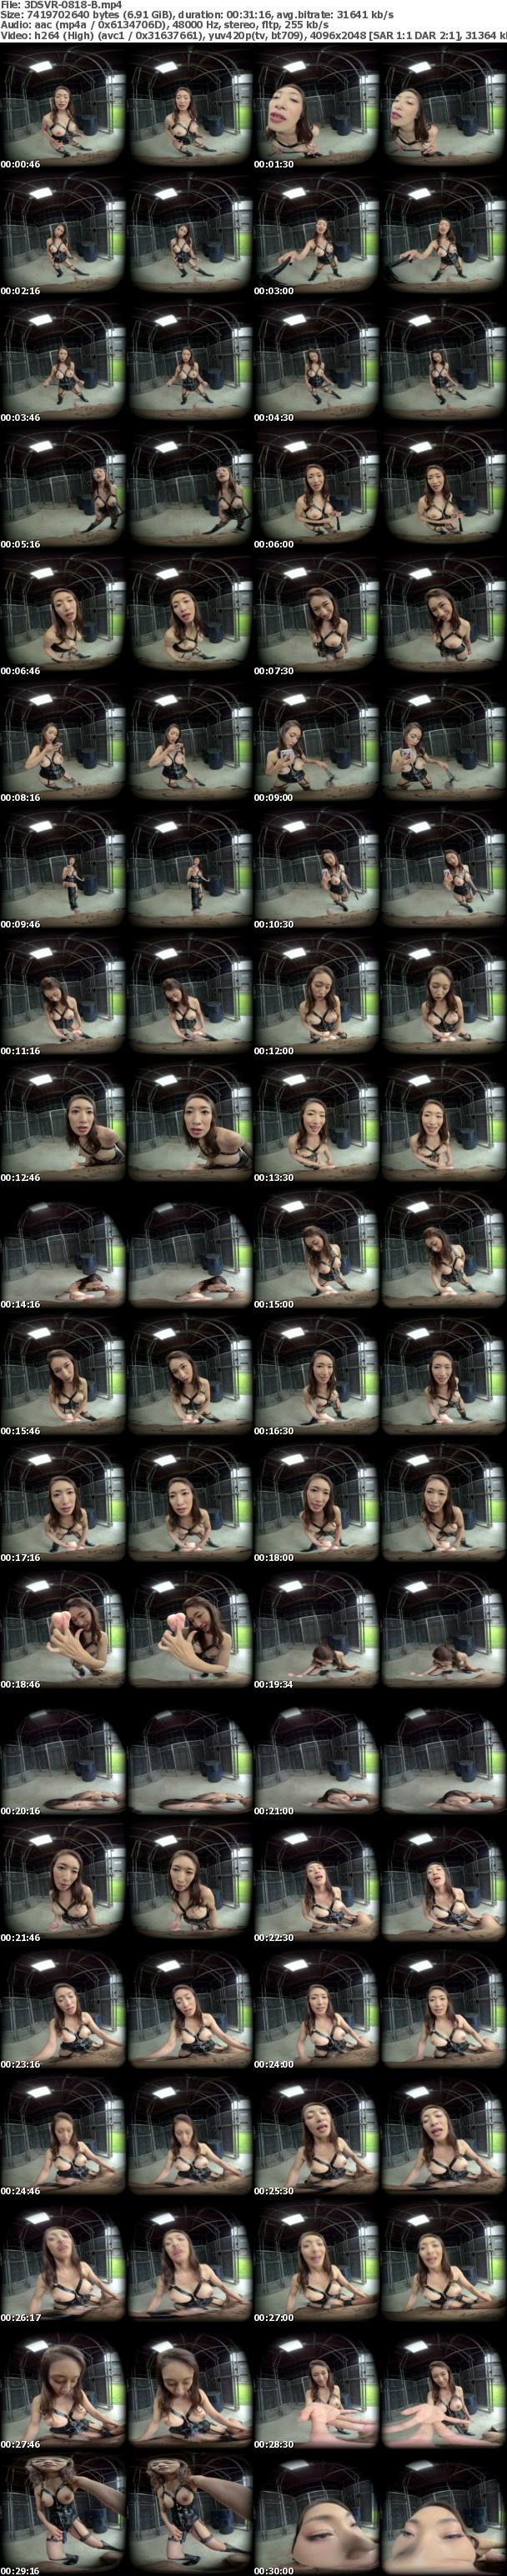 (VR) 3DSVR-0818 【M男専用】「ここでシコリなさい…」小早川怜子に野外露出させられるVR 遠隔オナニーJOI・全裸散歩で排尿指示・拘束アナル調教…ご主人様の命令には絶対服従!